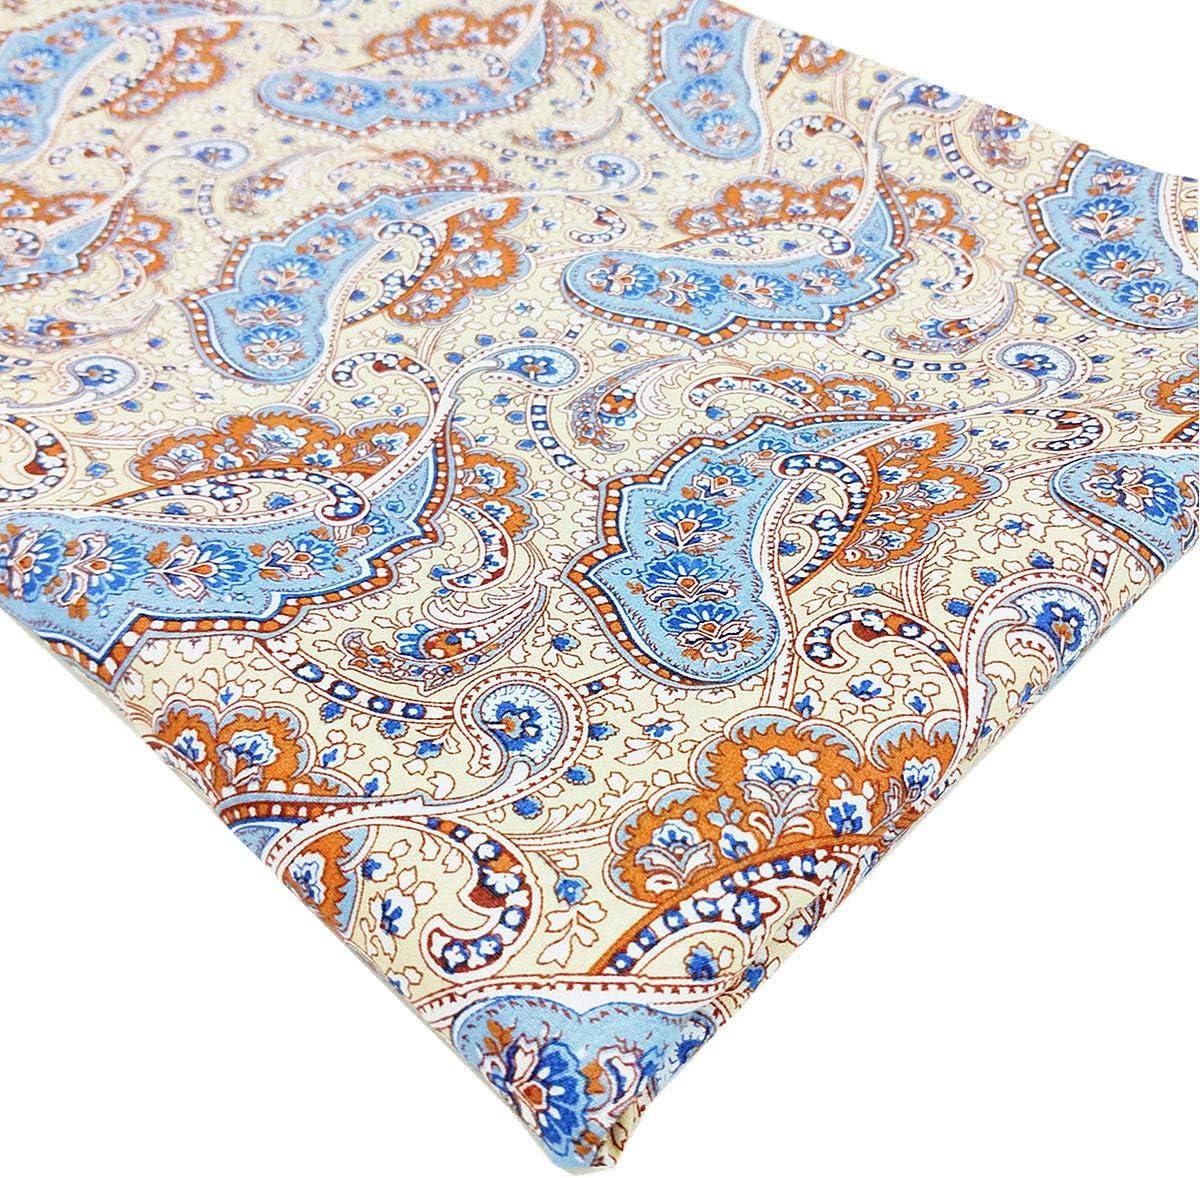 Black, 1 Yard Tong Gu Retro Paisley Floral Printed Fabric 100/% Cotton Clothing Accessories DIY Craft